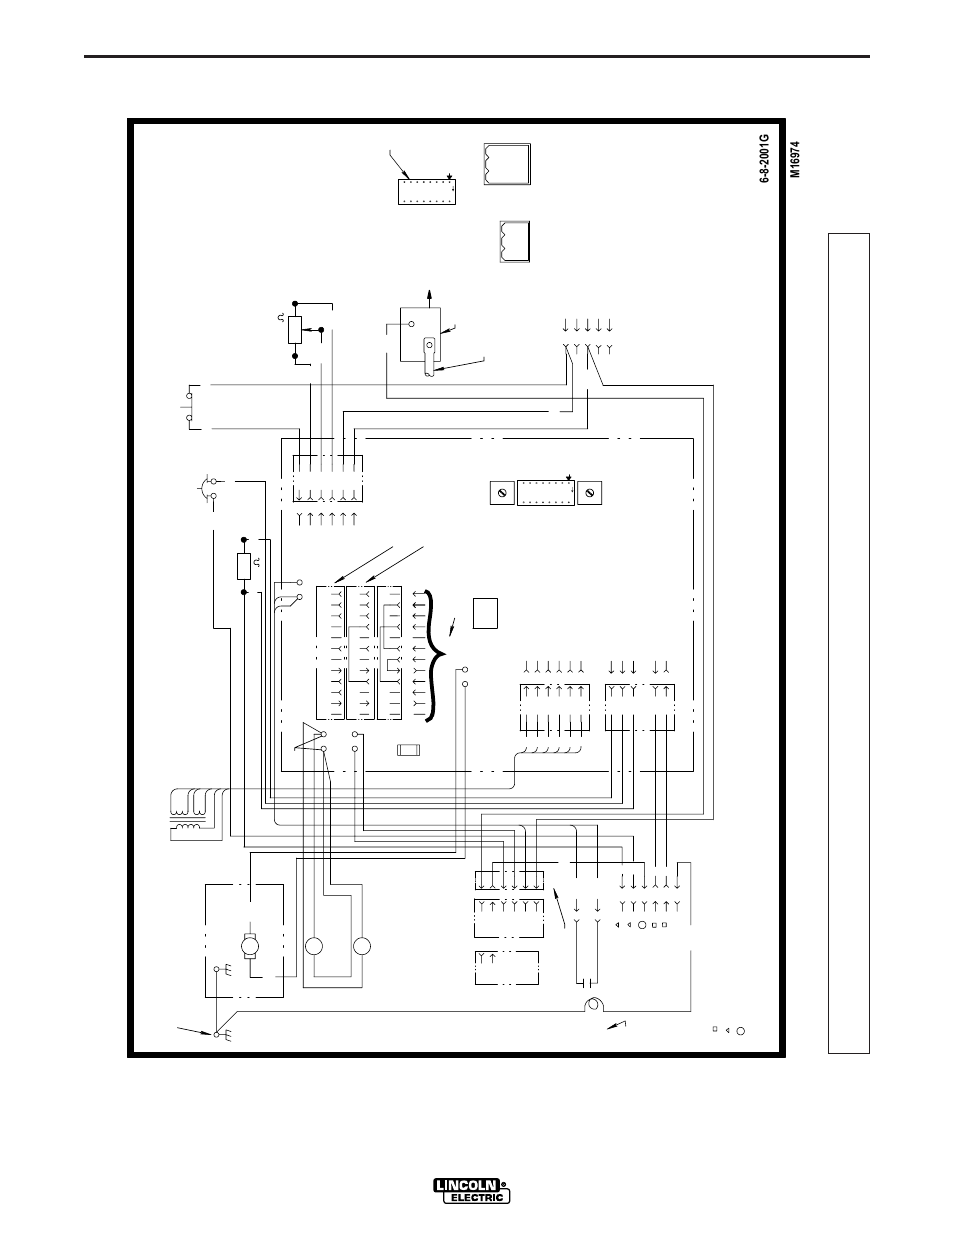 lincoln ln 7 wiring diagram